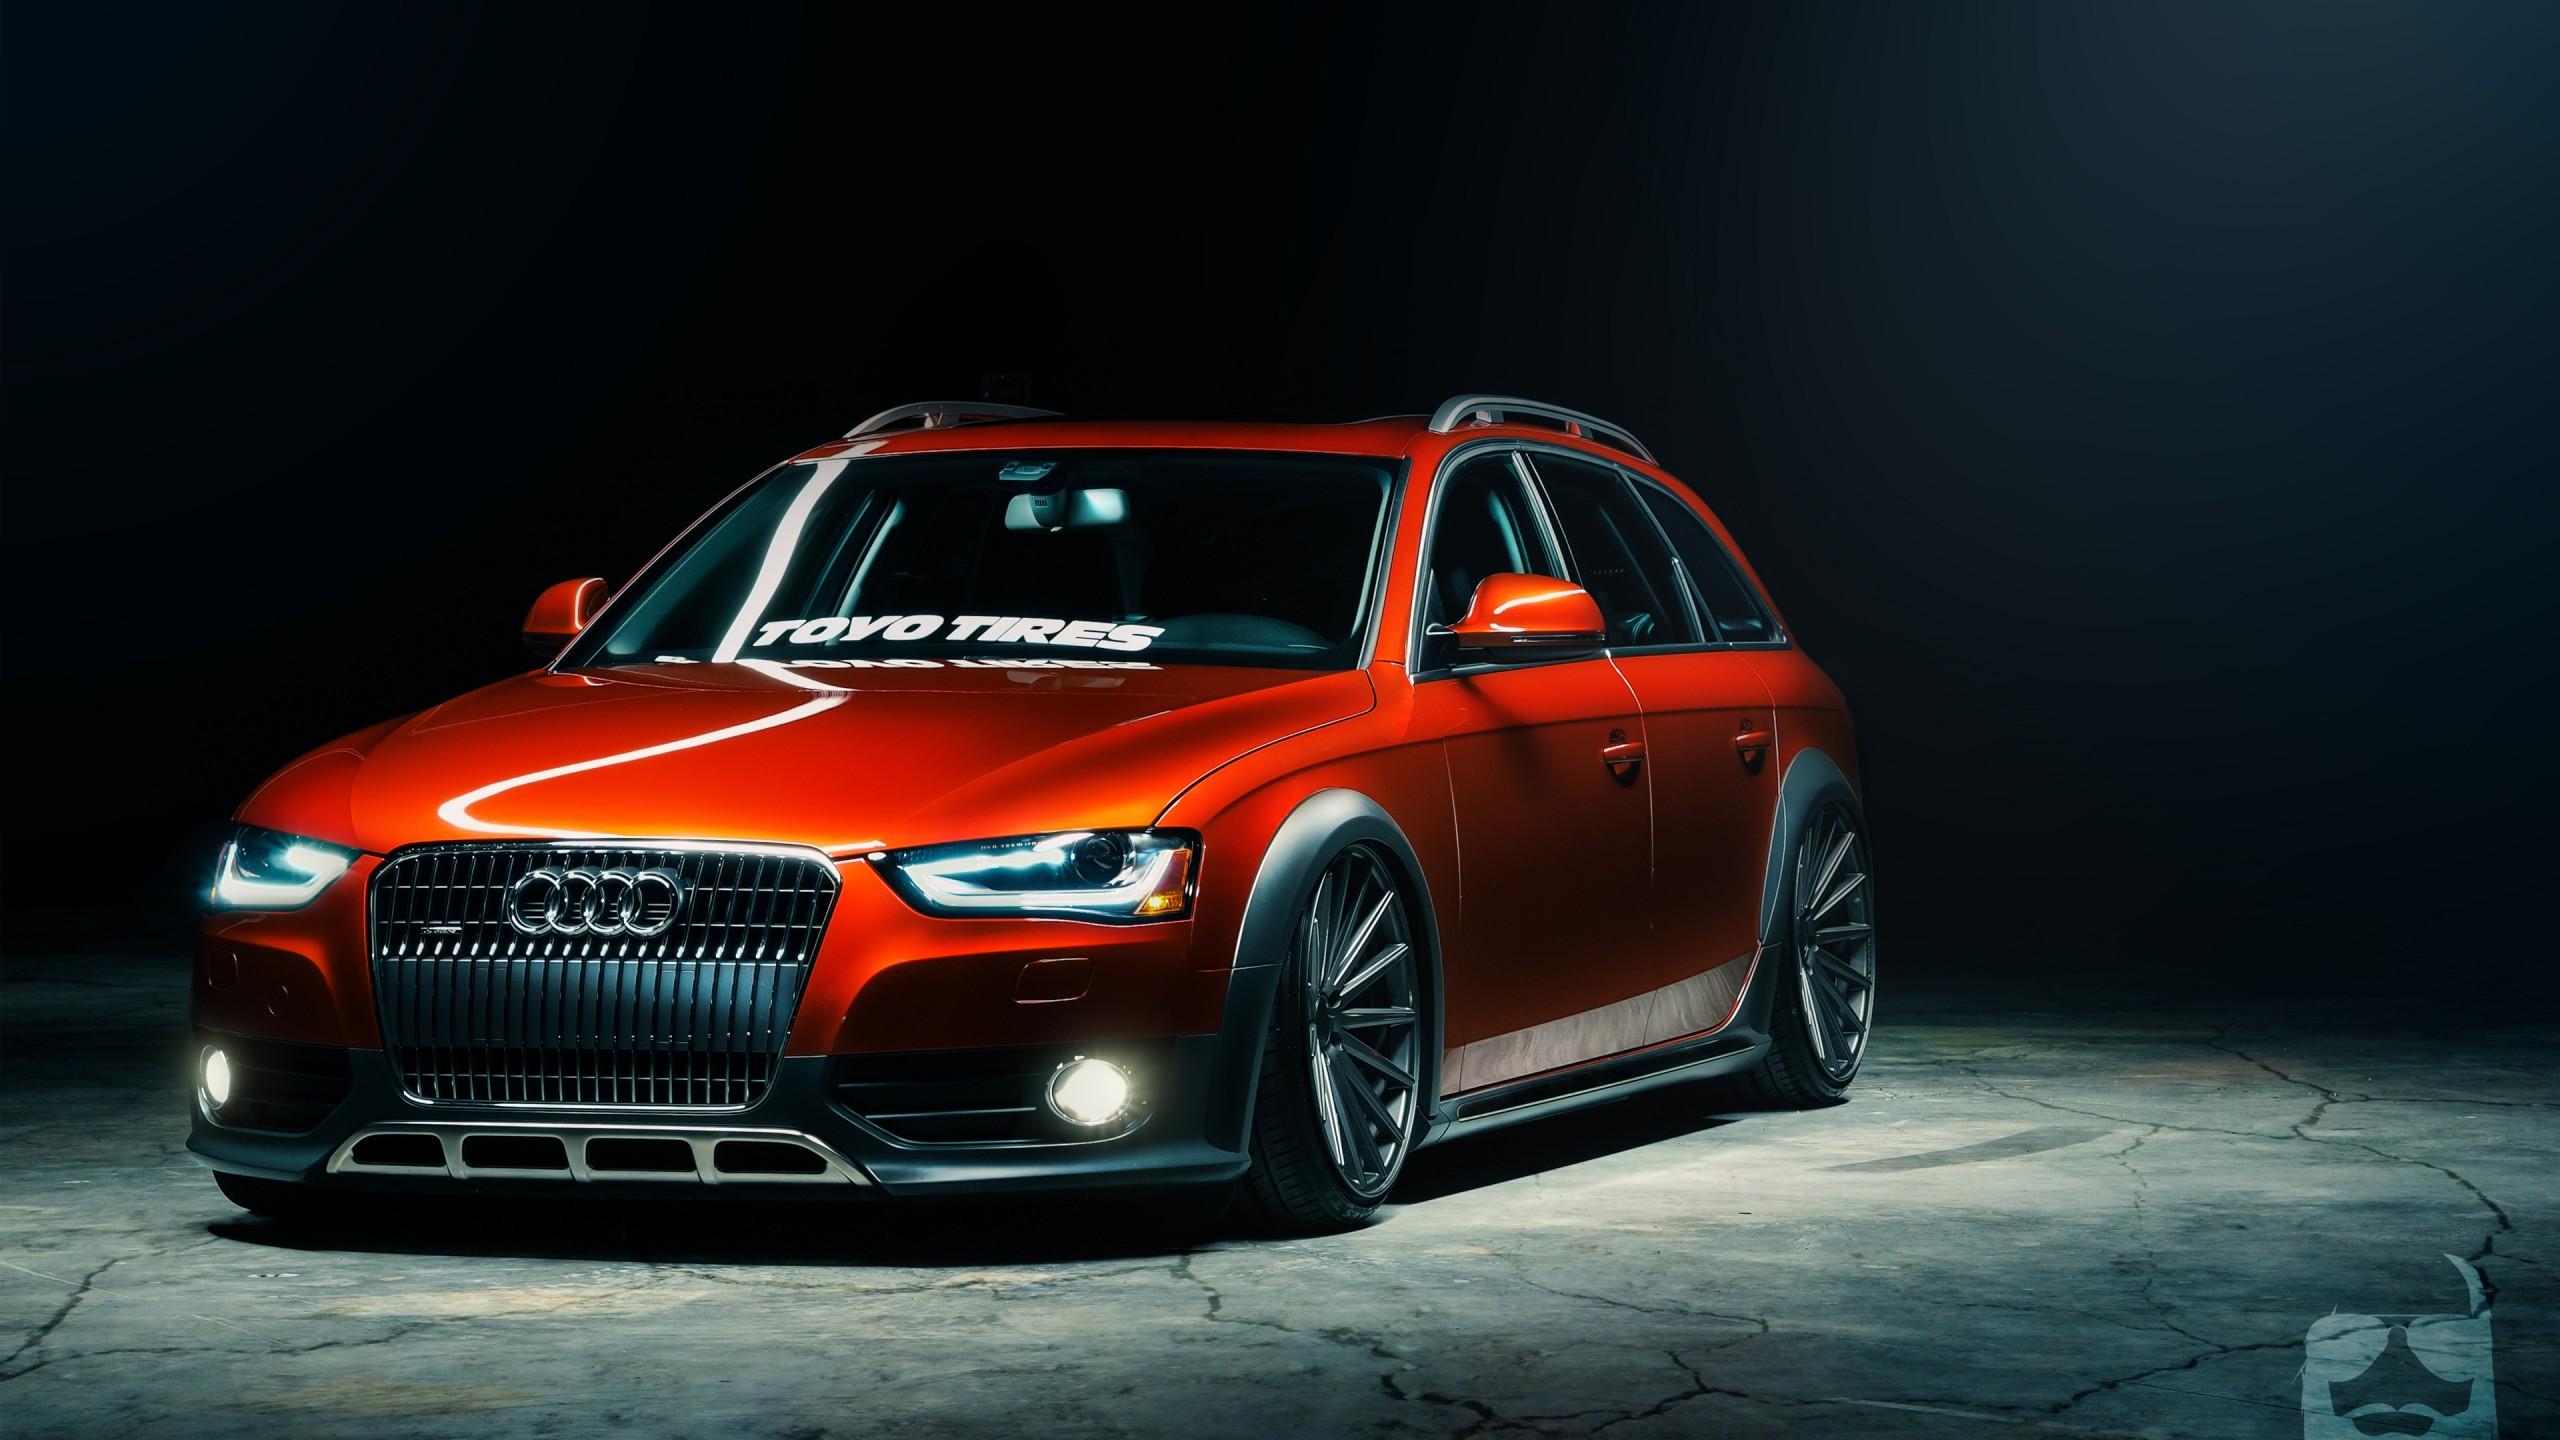 Audi Allroad Wallpaper Hd Car Wallpapers Id 5511